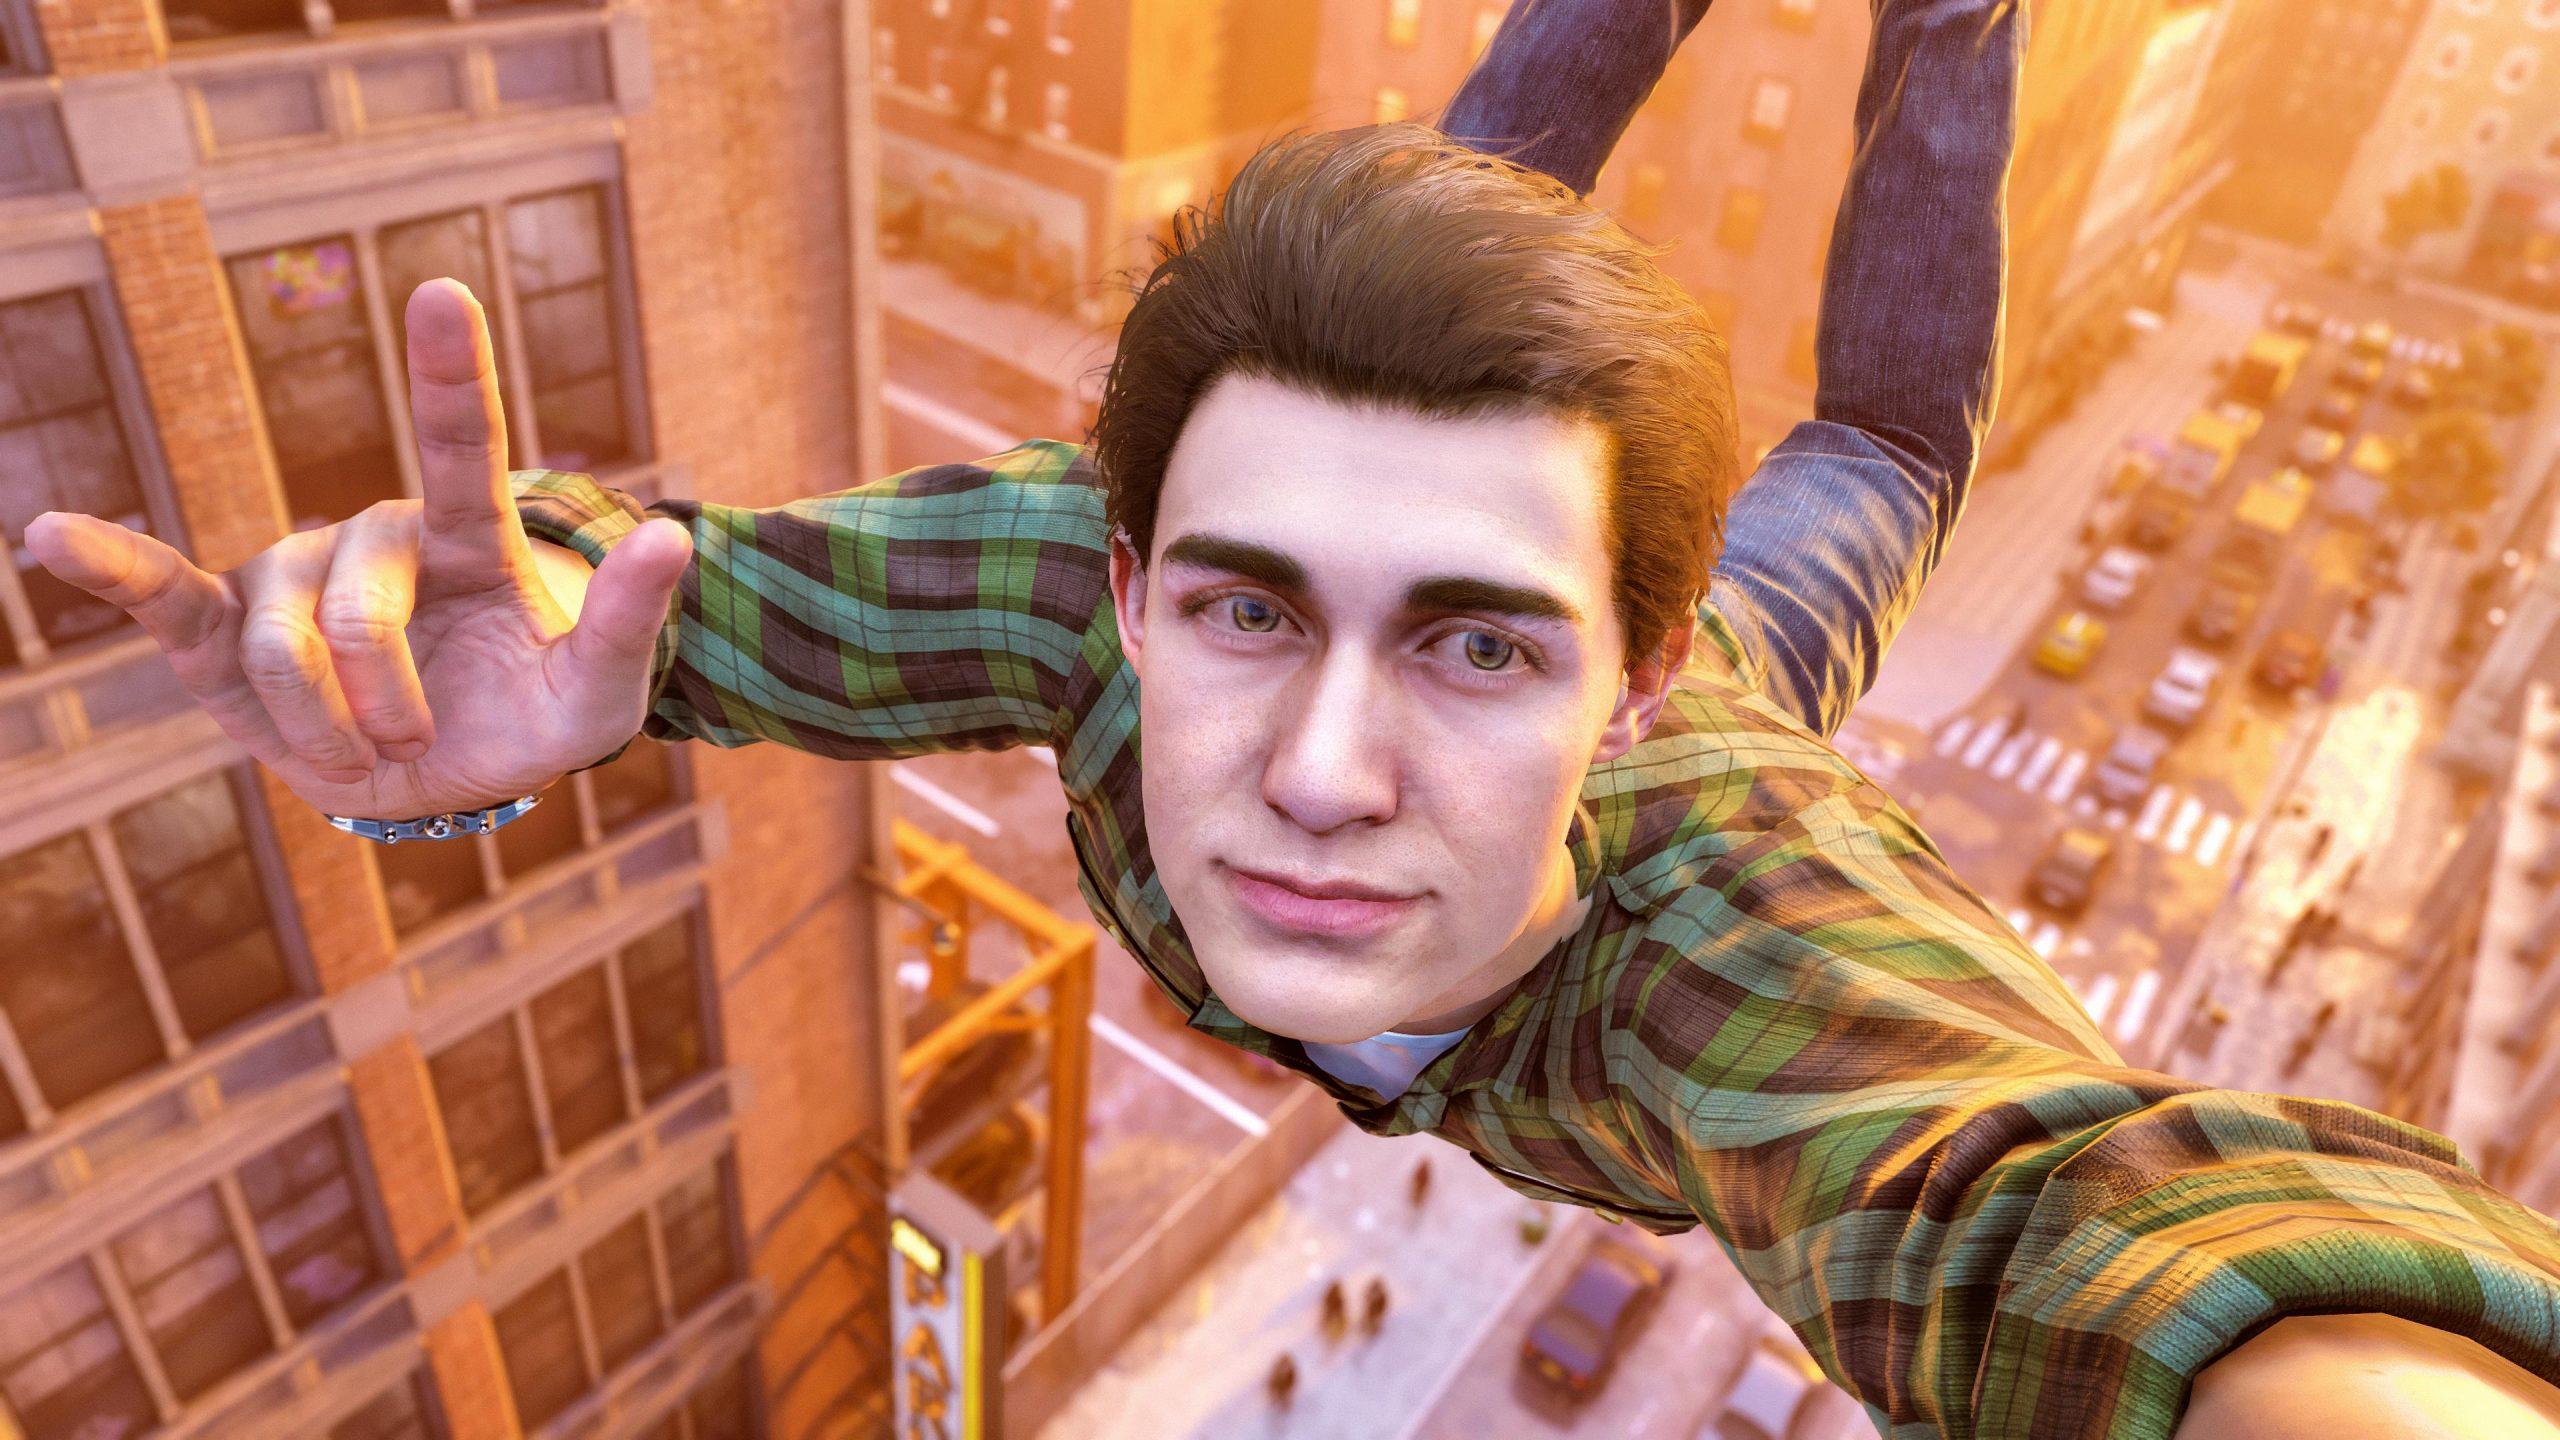 Tom Holland Arrives in Atlanta to Begin Filming Spider-Man 3!